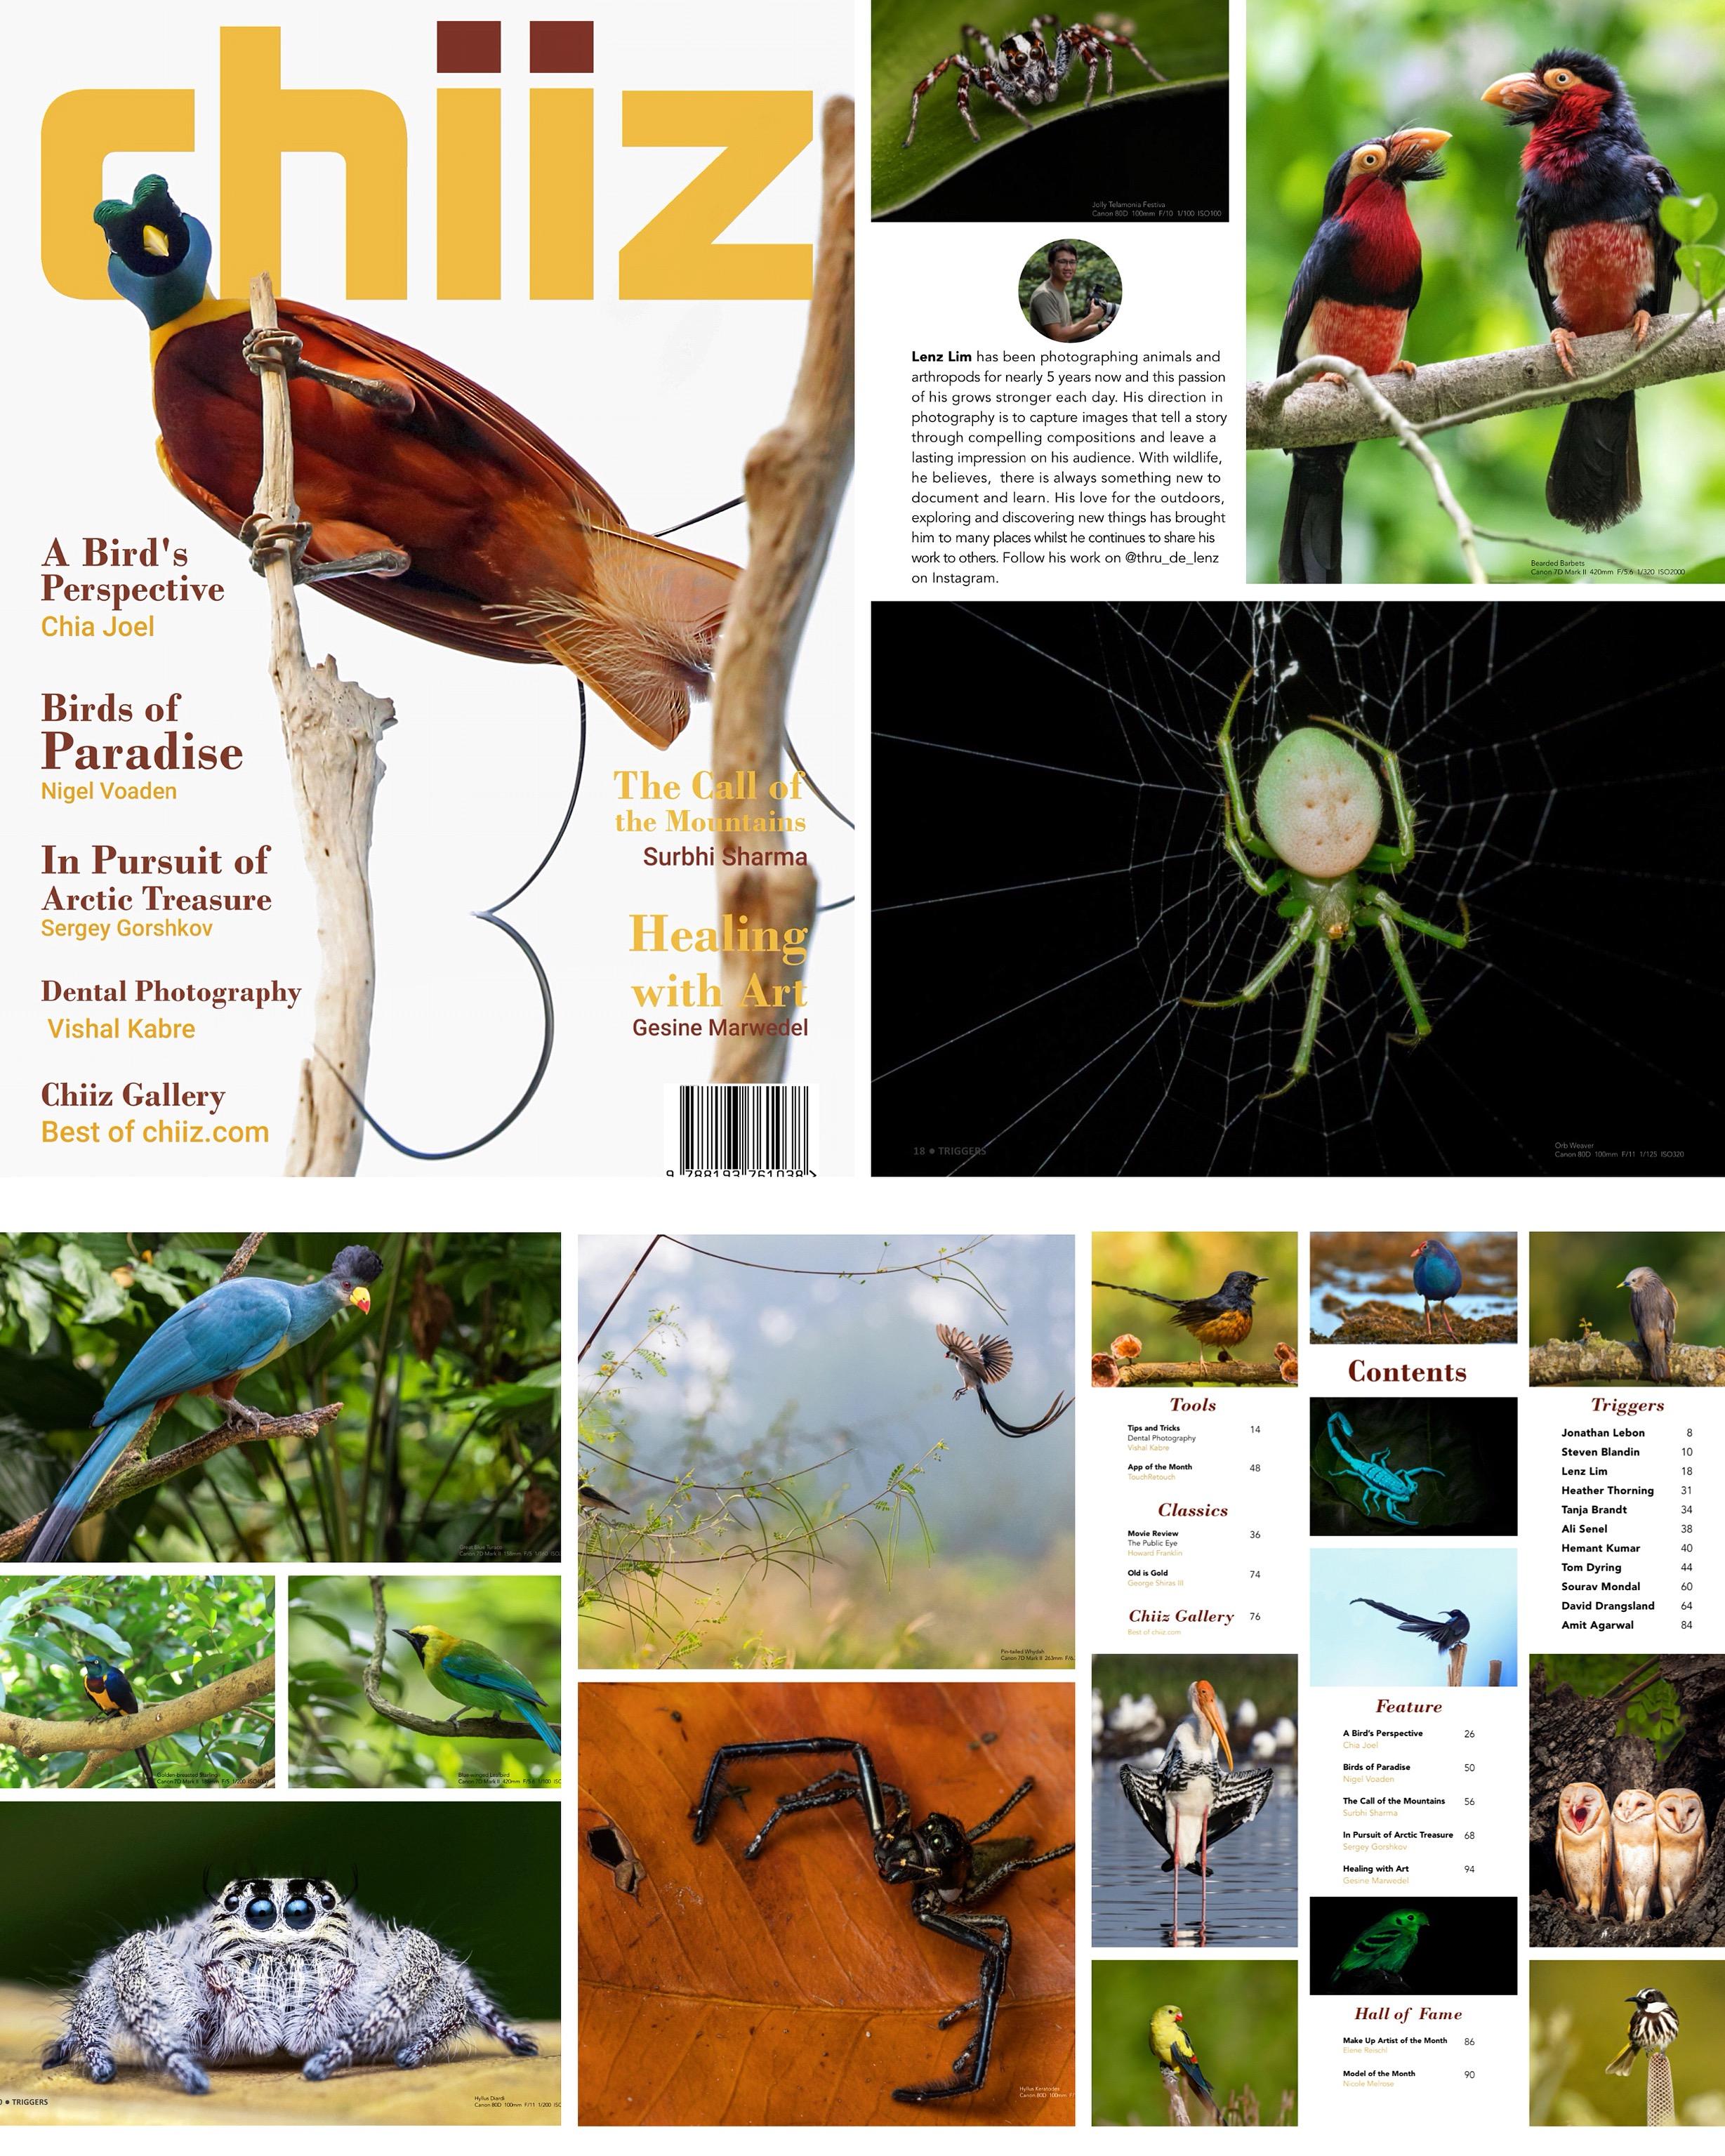 Chiiz Magazine Lenz Lim